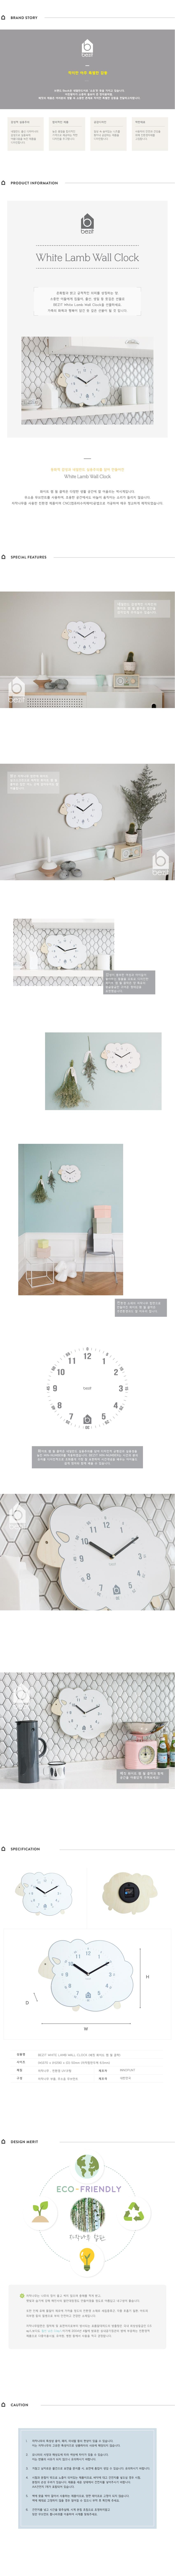 BEZIT - WHITE LAMB Wall Clock(무소음 벽시계) - 베짓, 23,100원, 벽시계, 우드벽시계